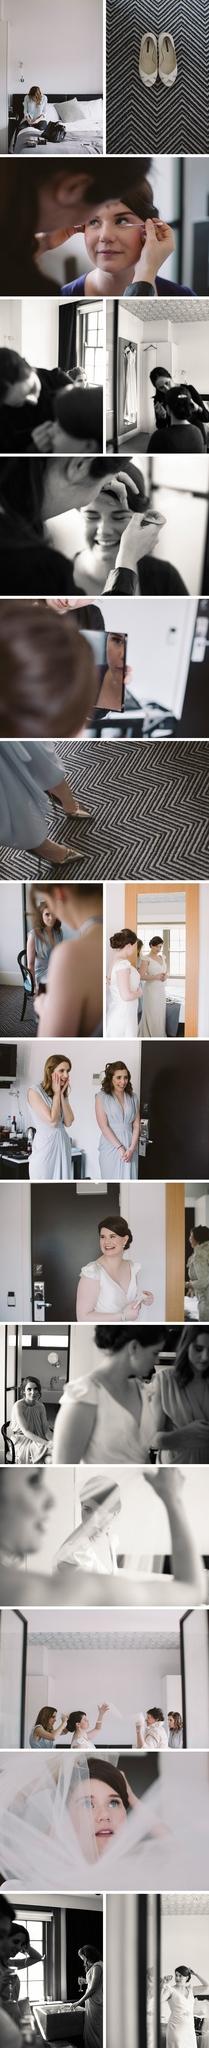 Thorson Photography Canberra Wedding